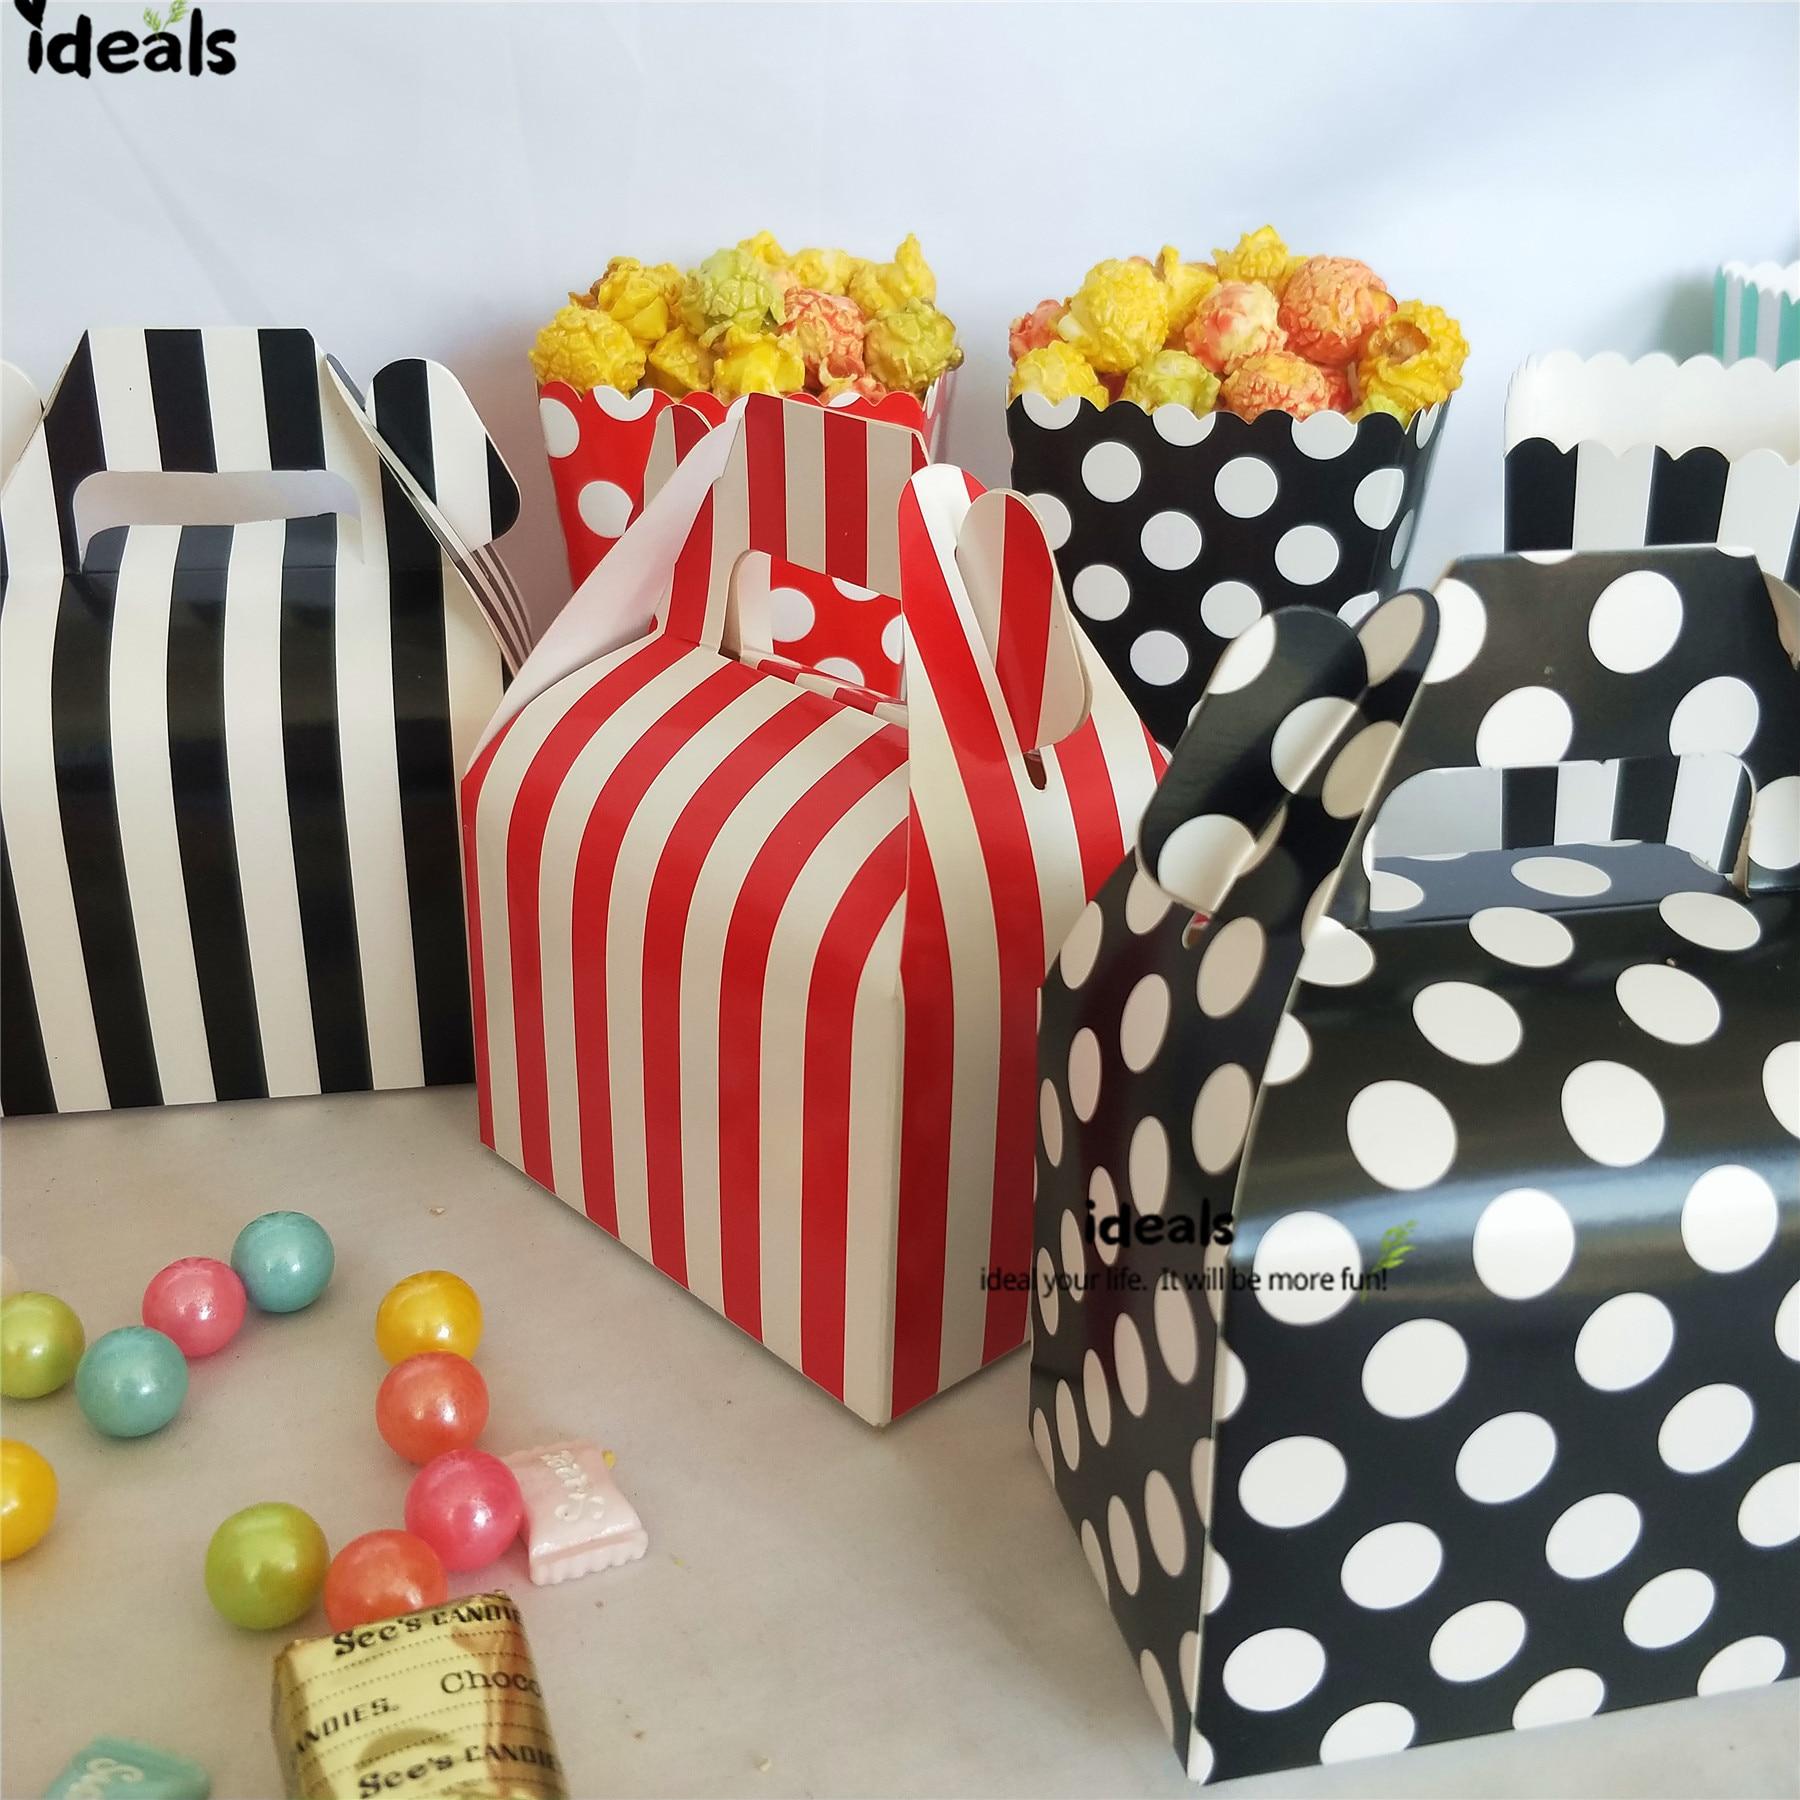 12 x Candy Buffet Rainbow Colours Party Gable Box